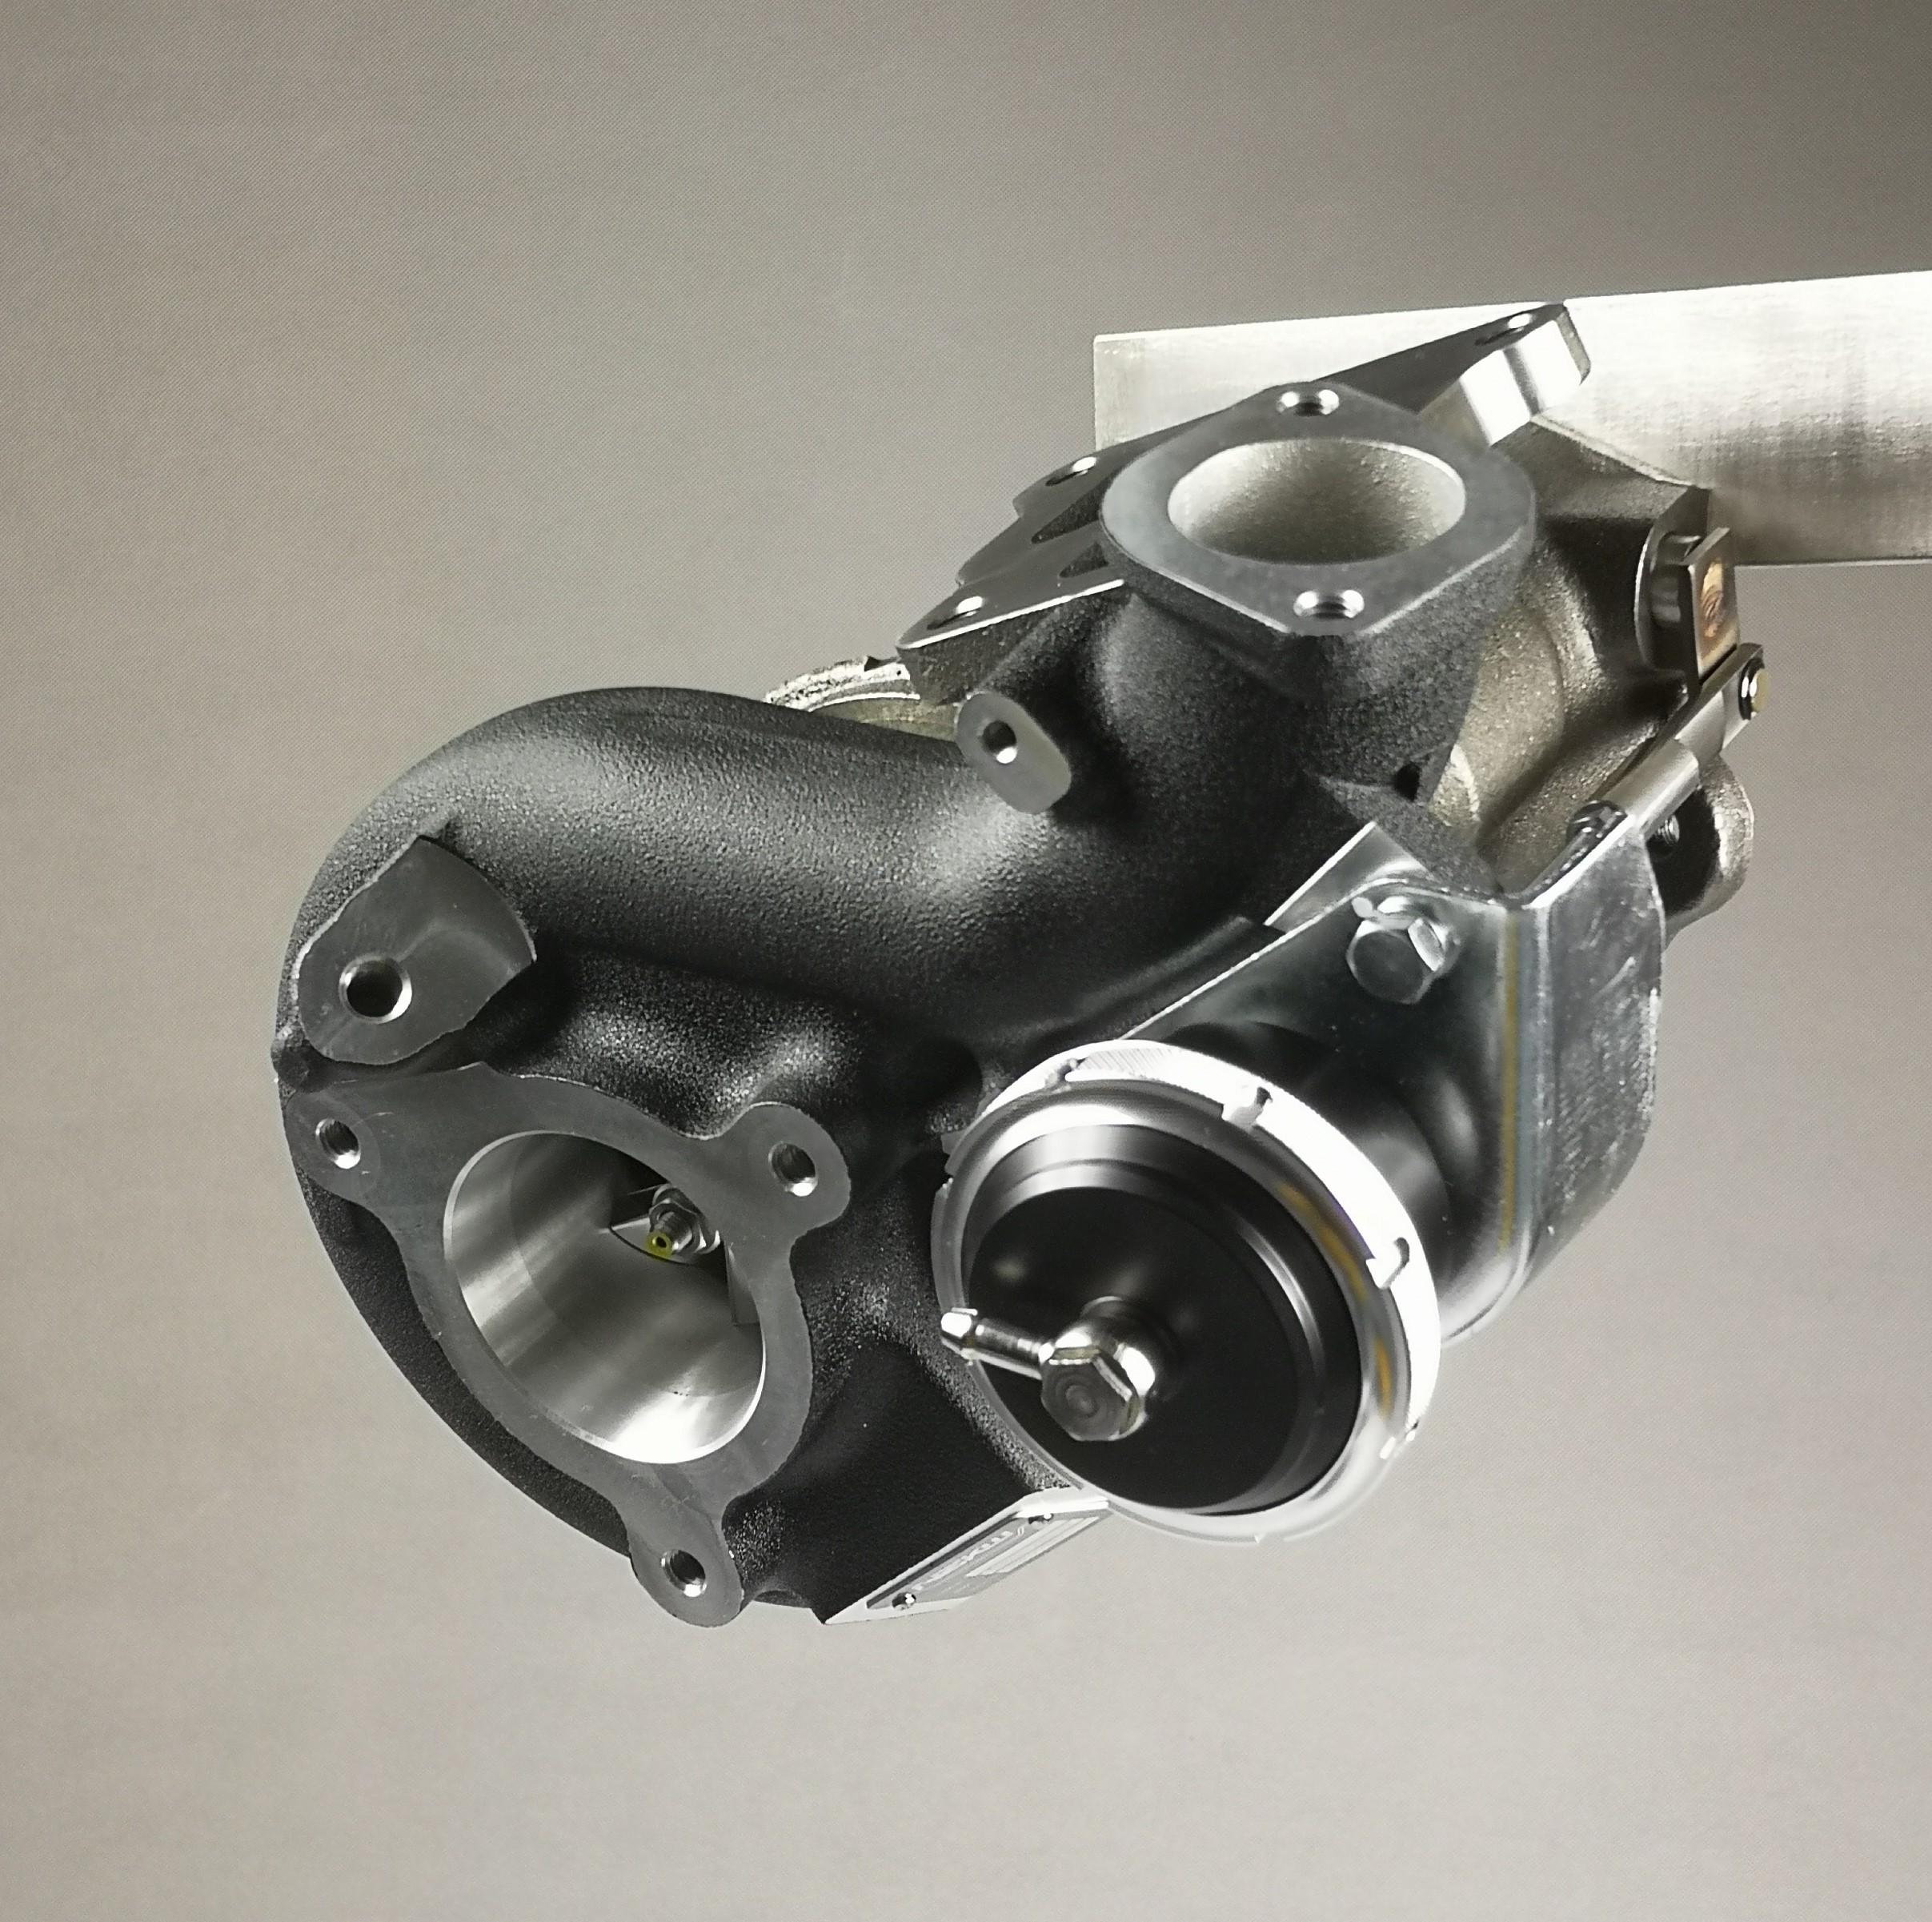 ST400 Turbo for Mitsubishi Evo X